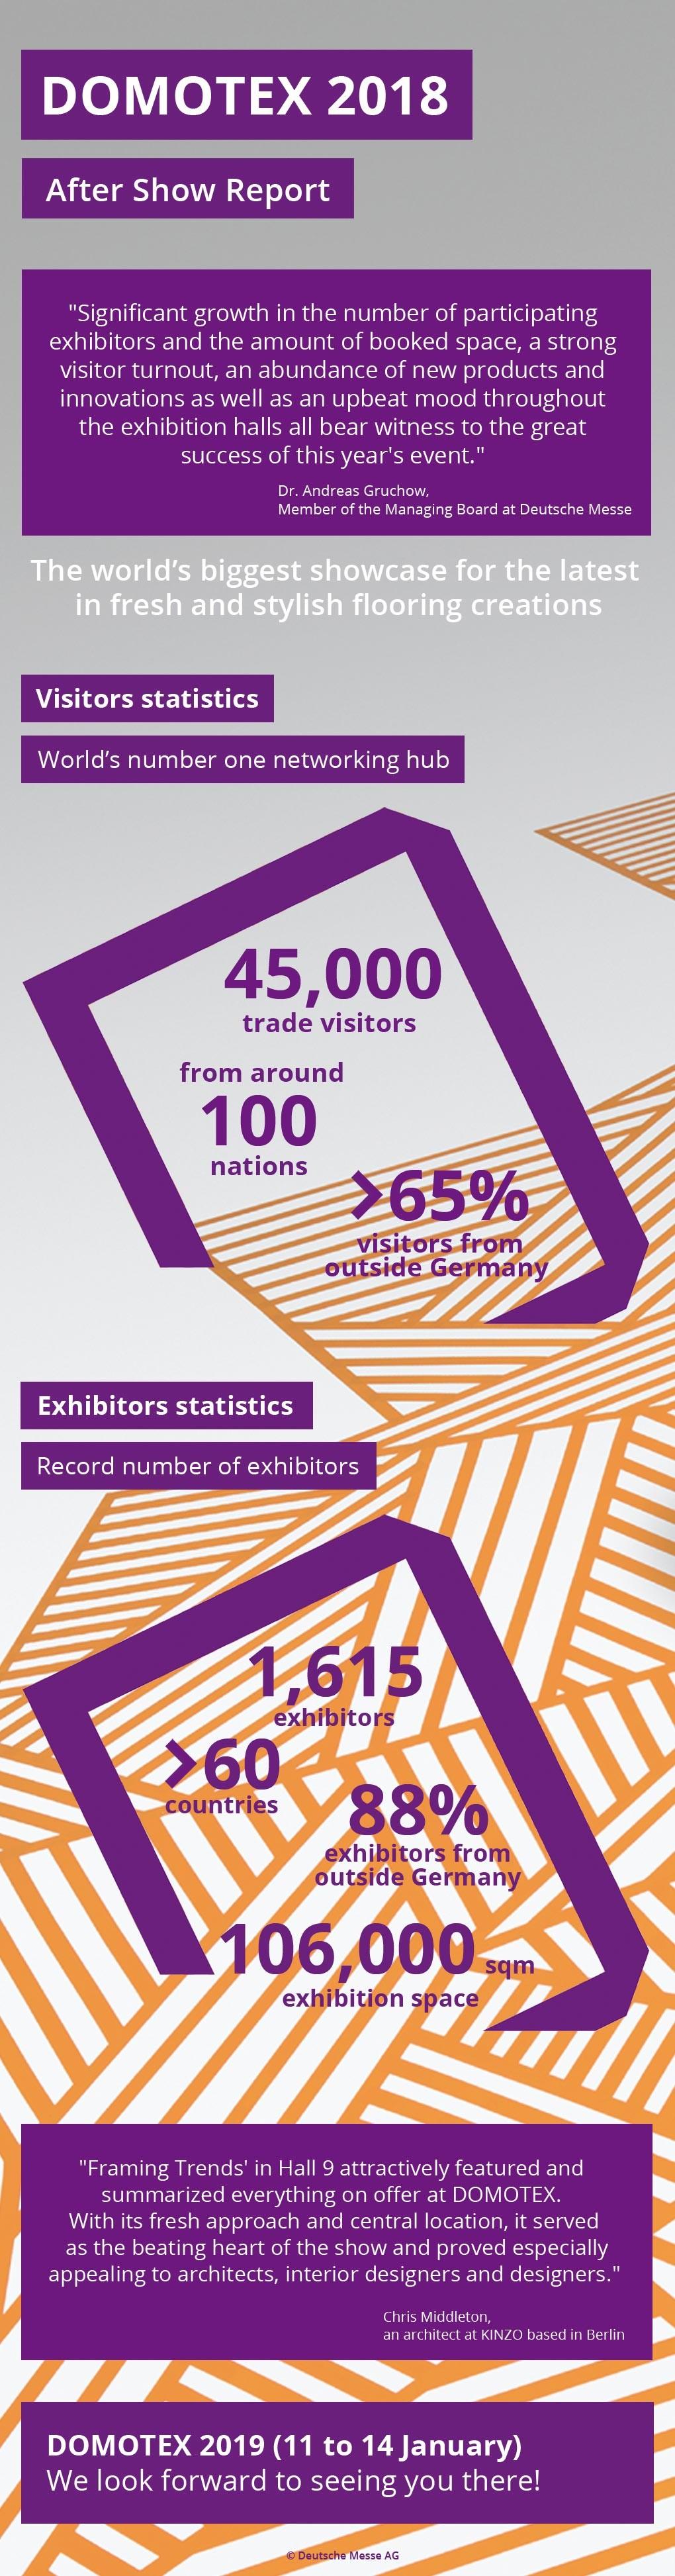 Infographie Domotex 2018